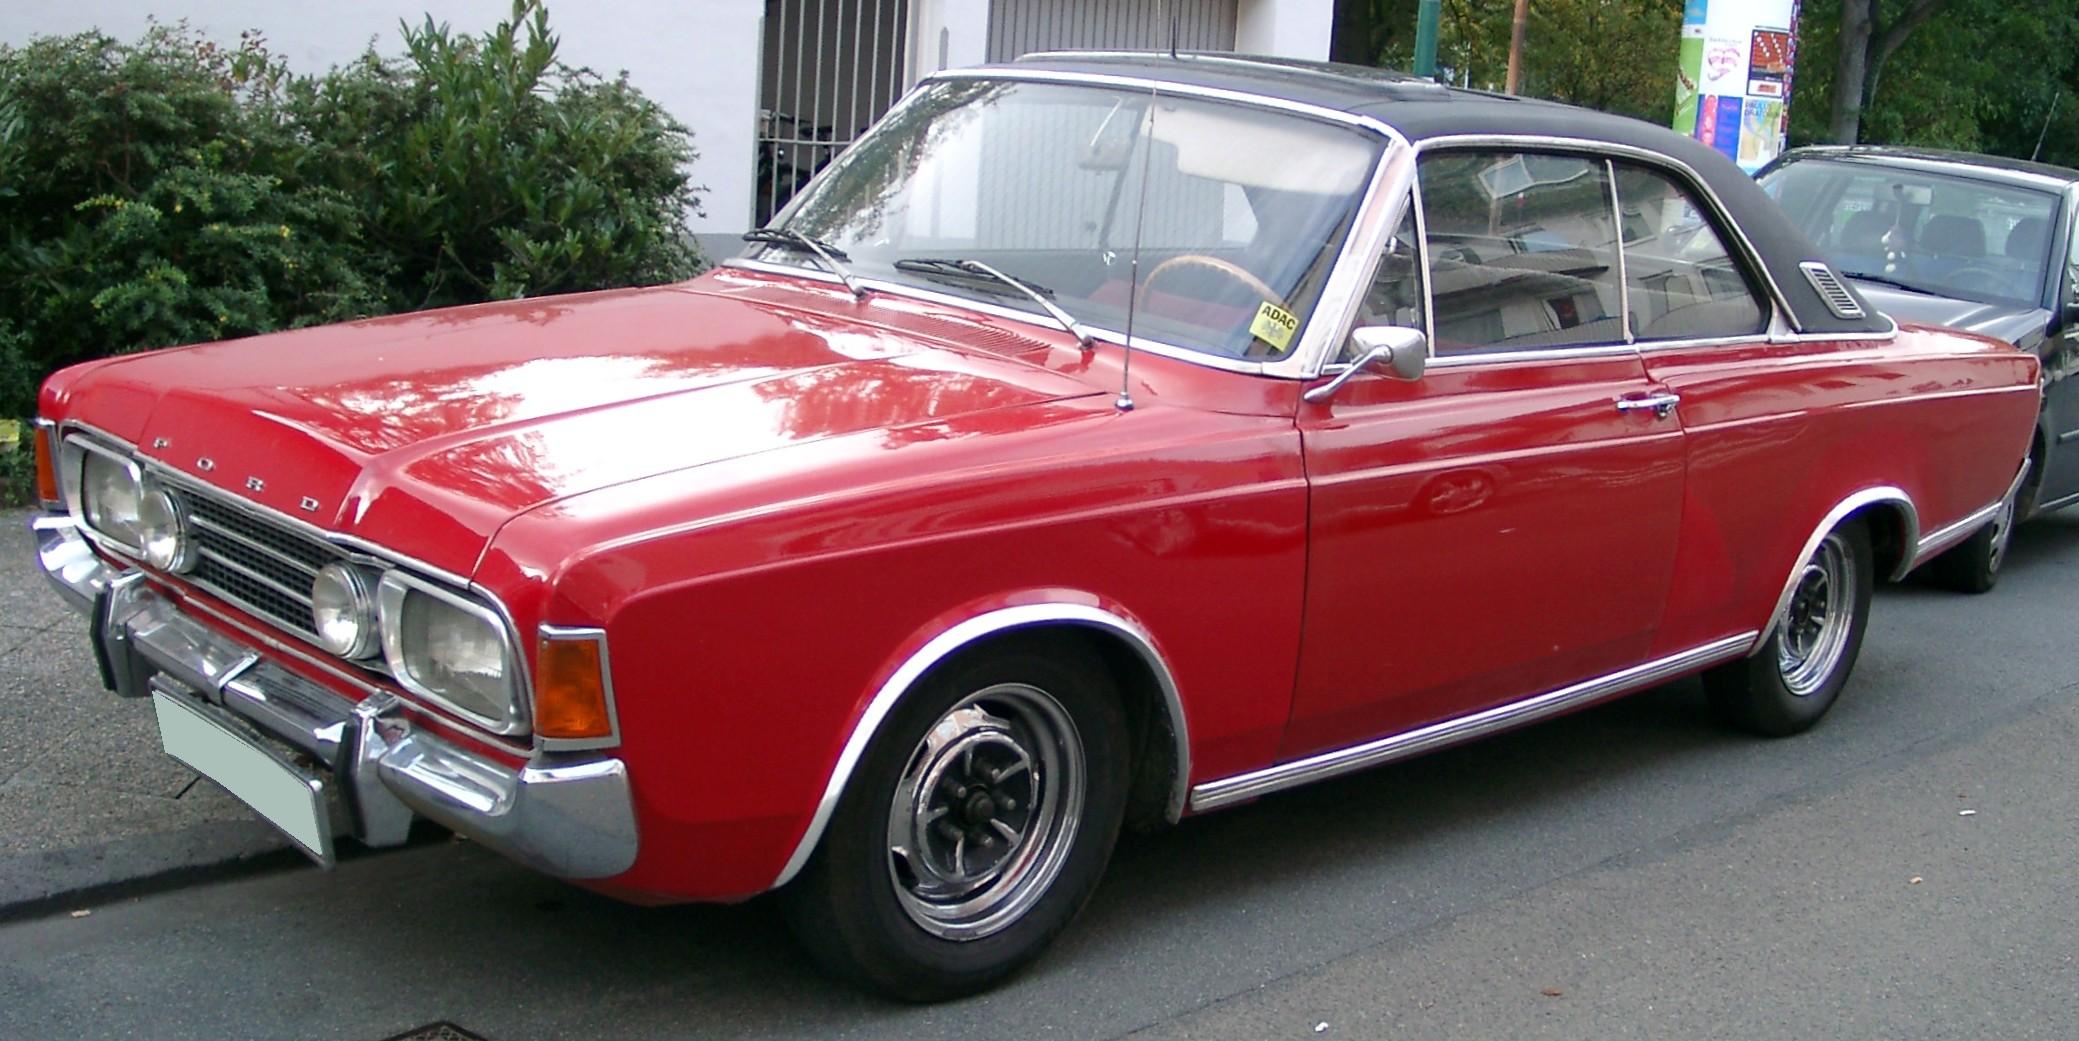 Ford_Taunus_20M_P7_front_20070924